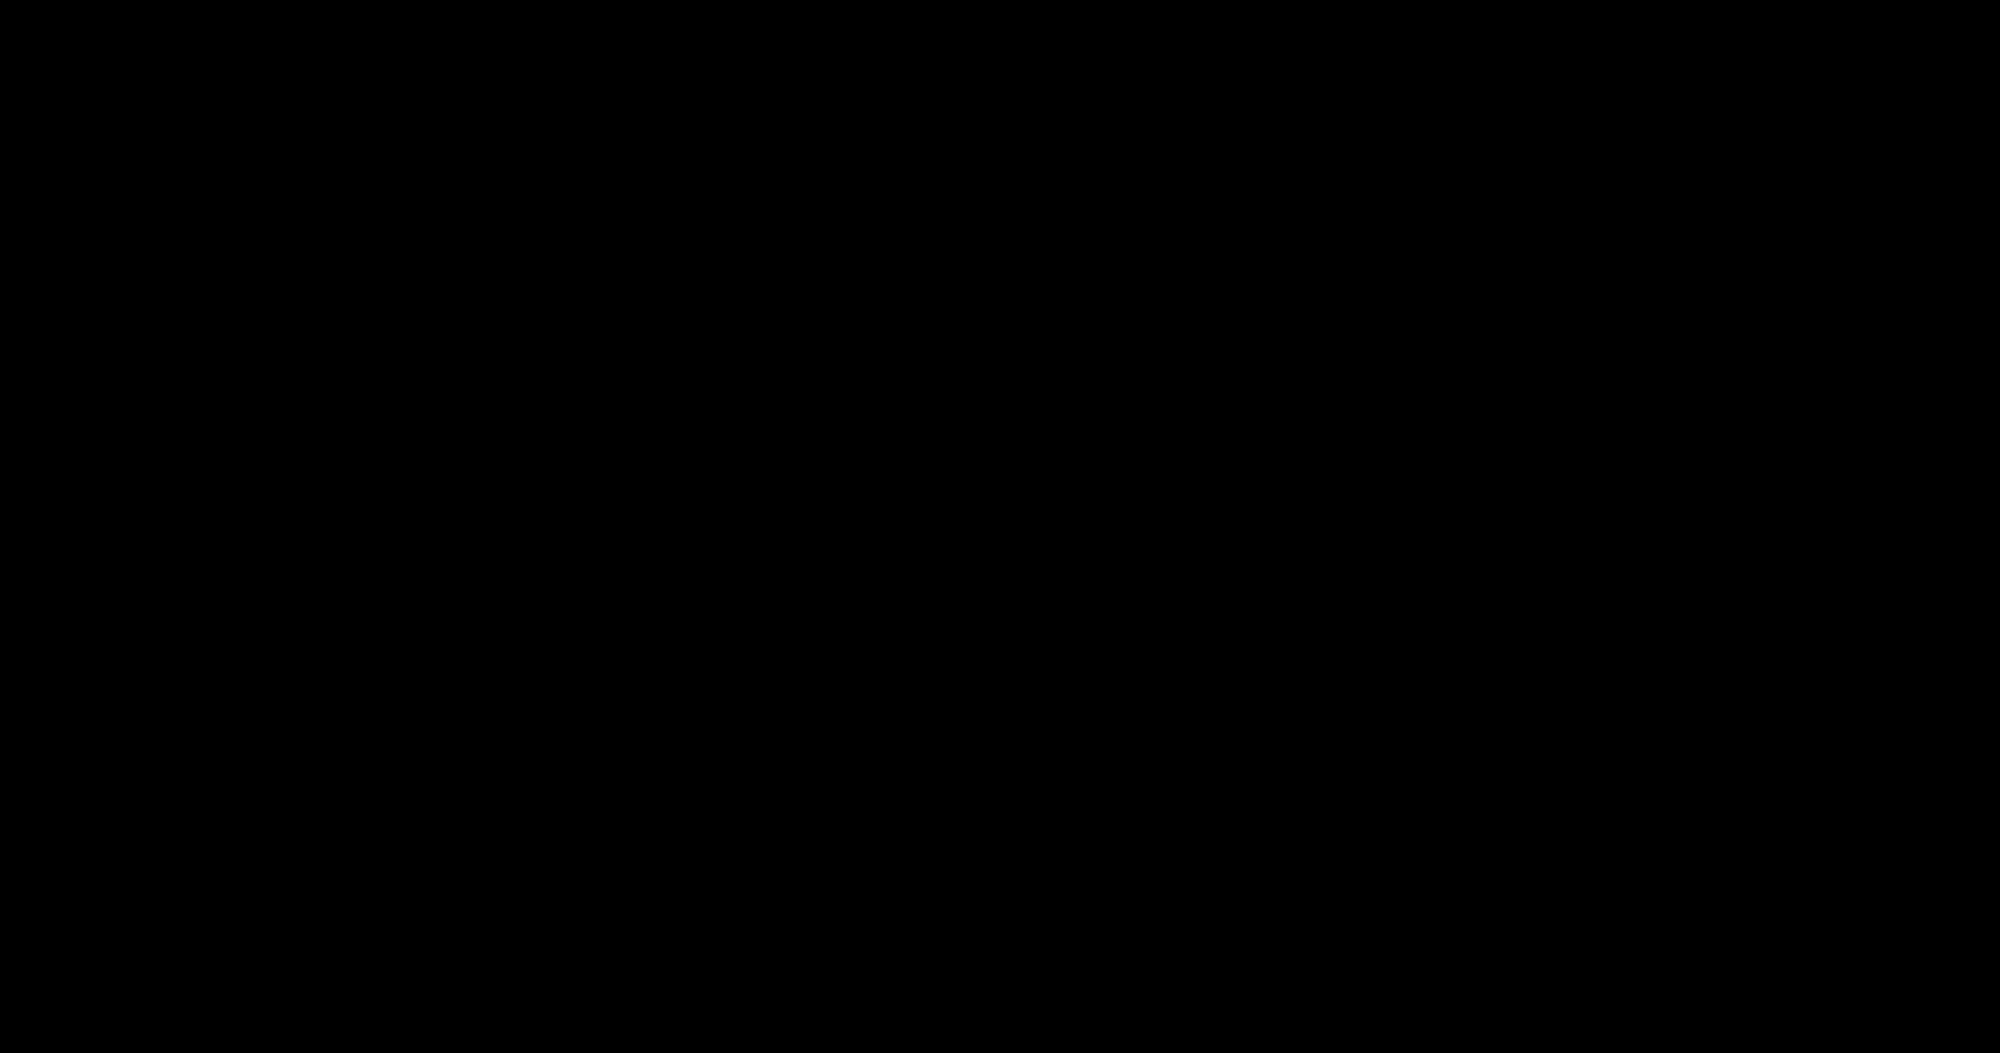 jpg freeuse stock File pfadsvgtutorial wikimedia commons. Usa svg